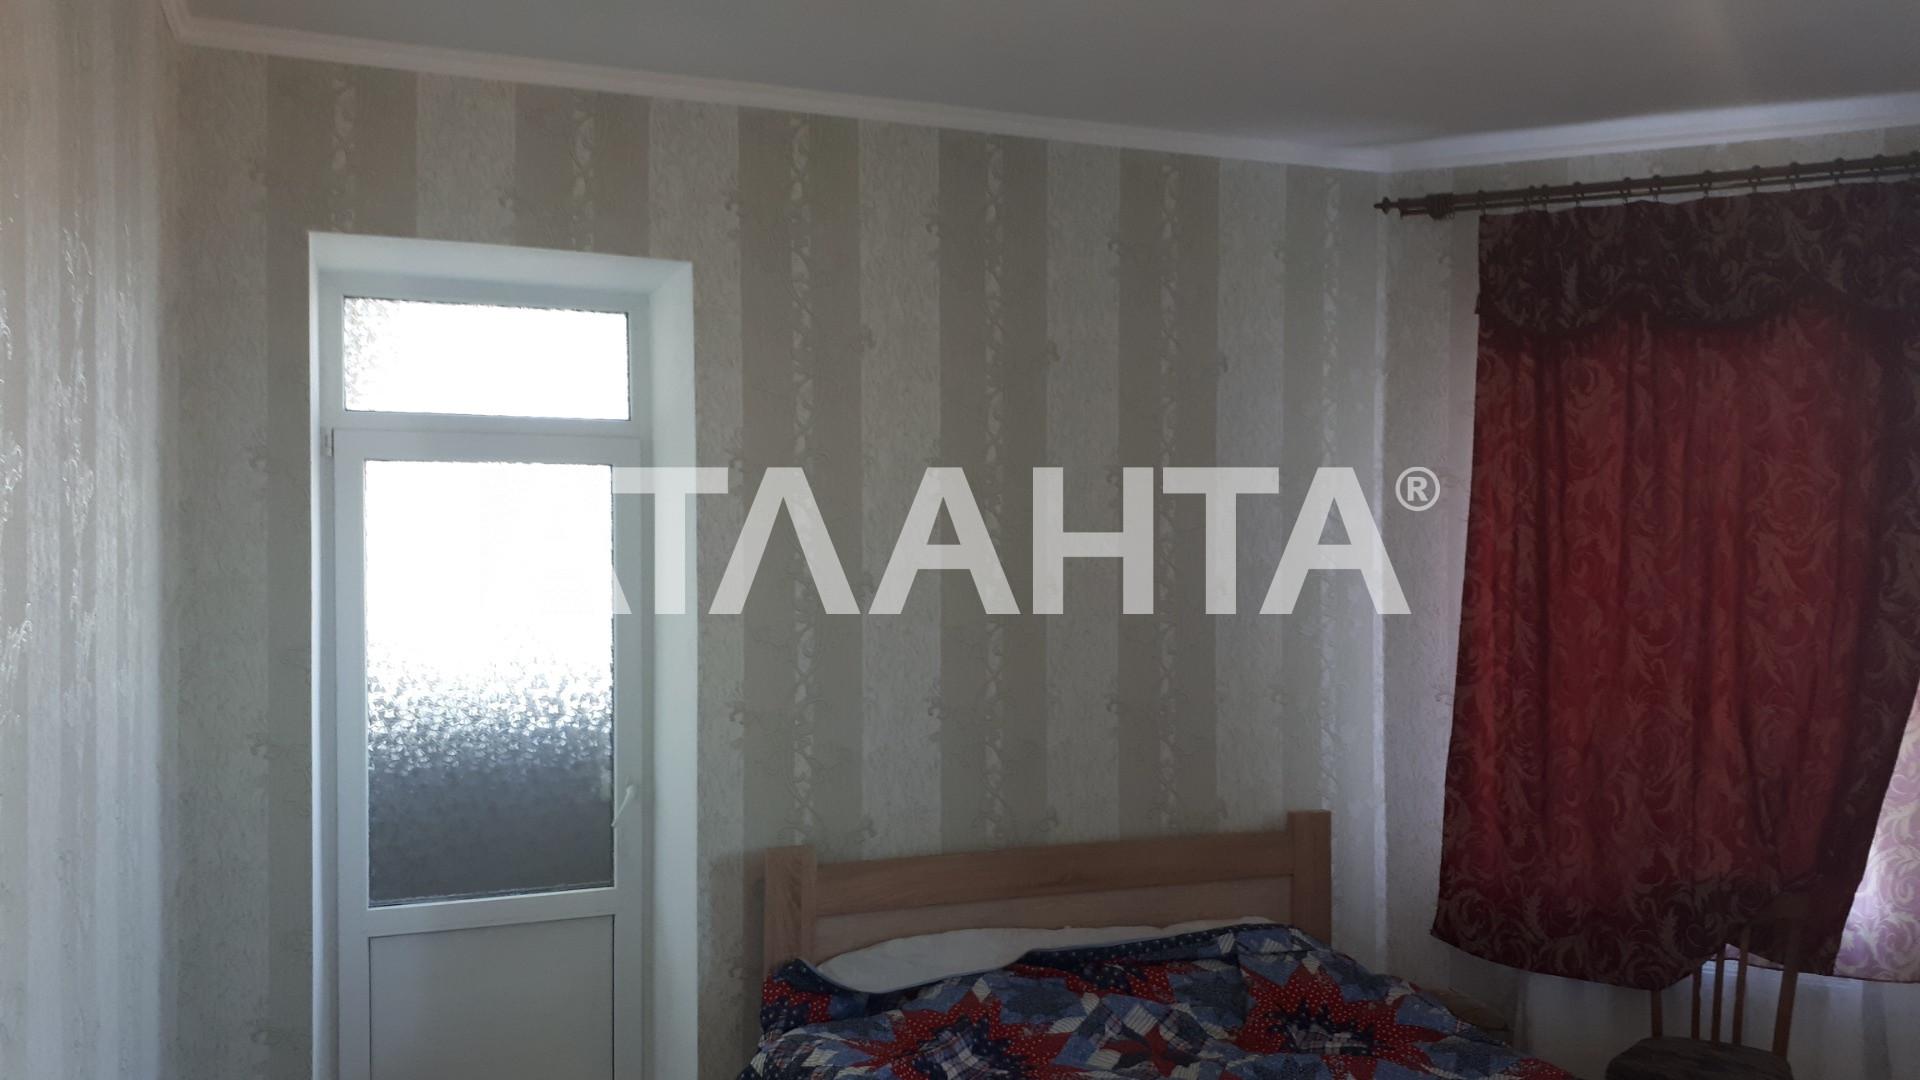 Продается 2-комнатная Квартира на ул. Хантадзе Пер. — 63 000 у.е. (фото №4)